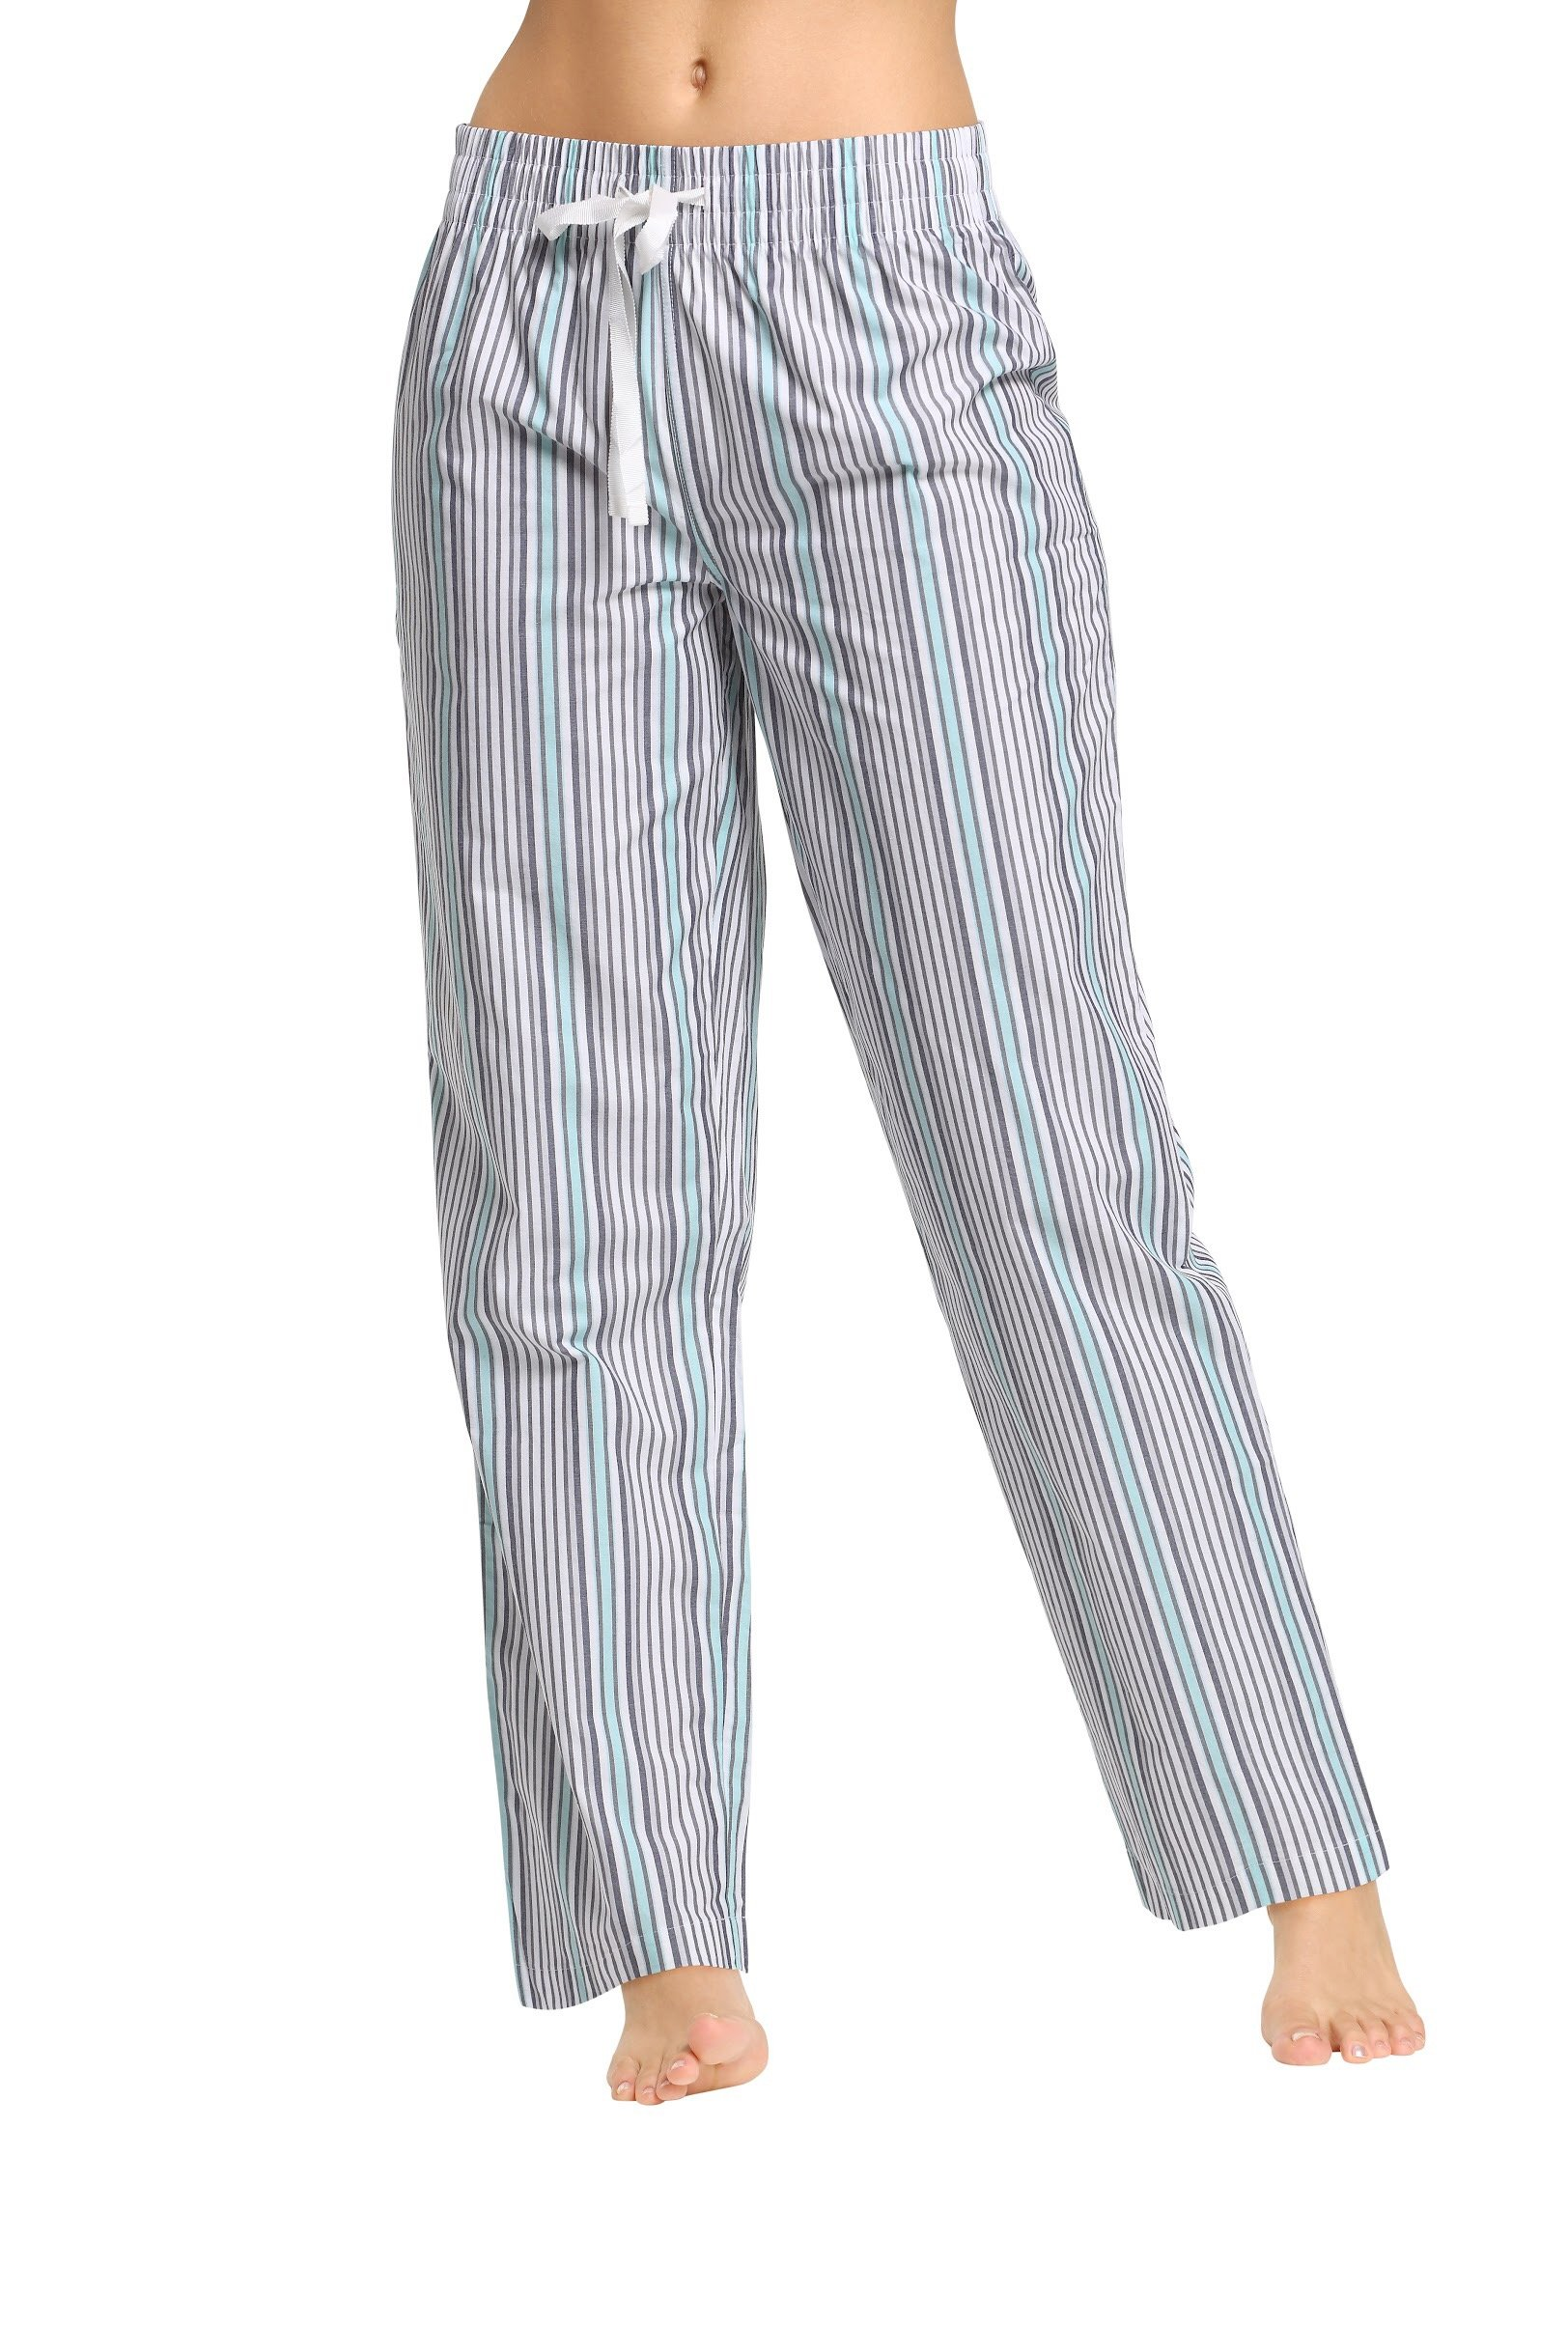 0596abe28ea Galleon - CYZ Women s 100% Cotton Woven Sleep Pajama Pants-SeamistStripe-M